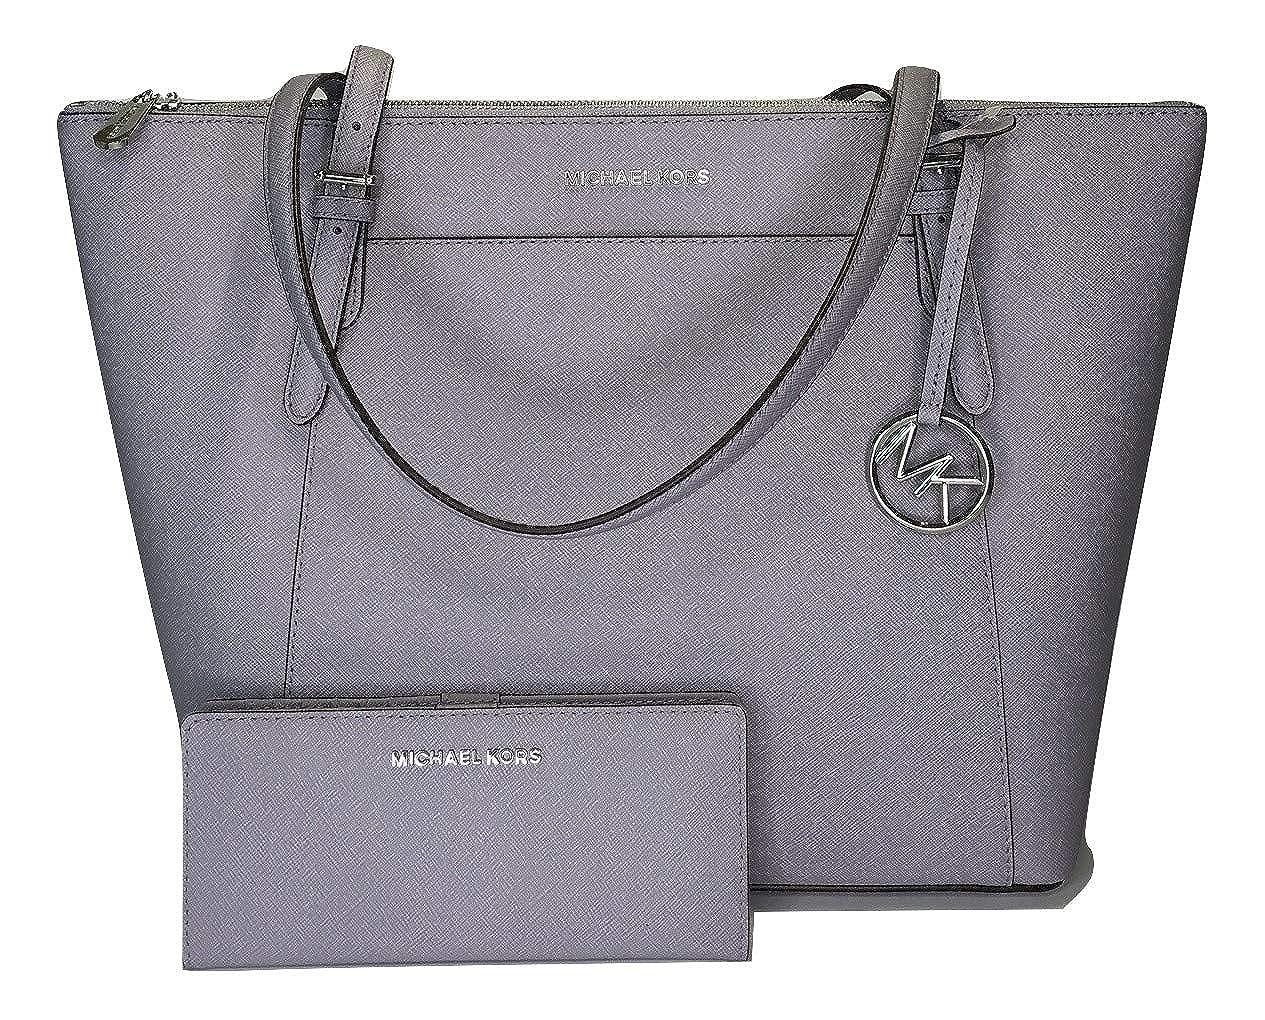 014103241dd8 Michael Kors Michael Michael Kors Ciara Large East West TZ Tote Bundled Jet  Set Travel Slim Bifold Wallet (Lilac): Handbags: Amazon.com